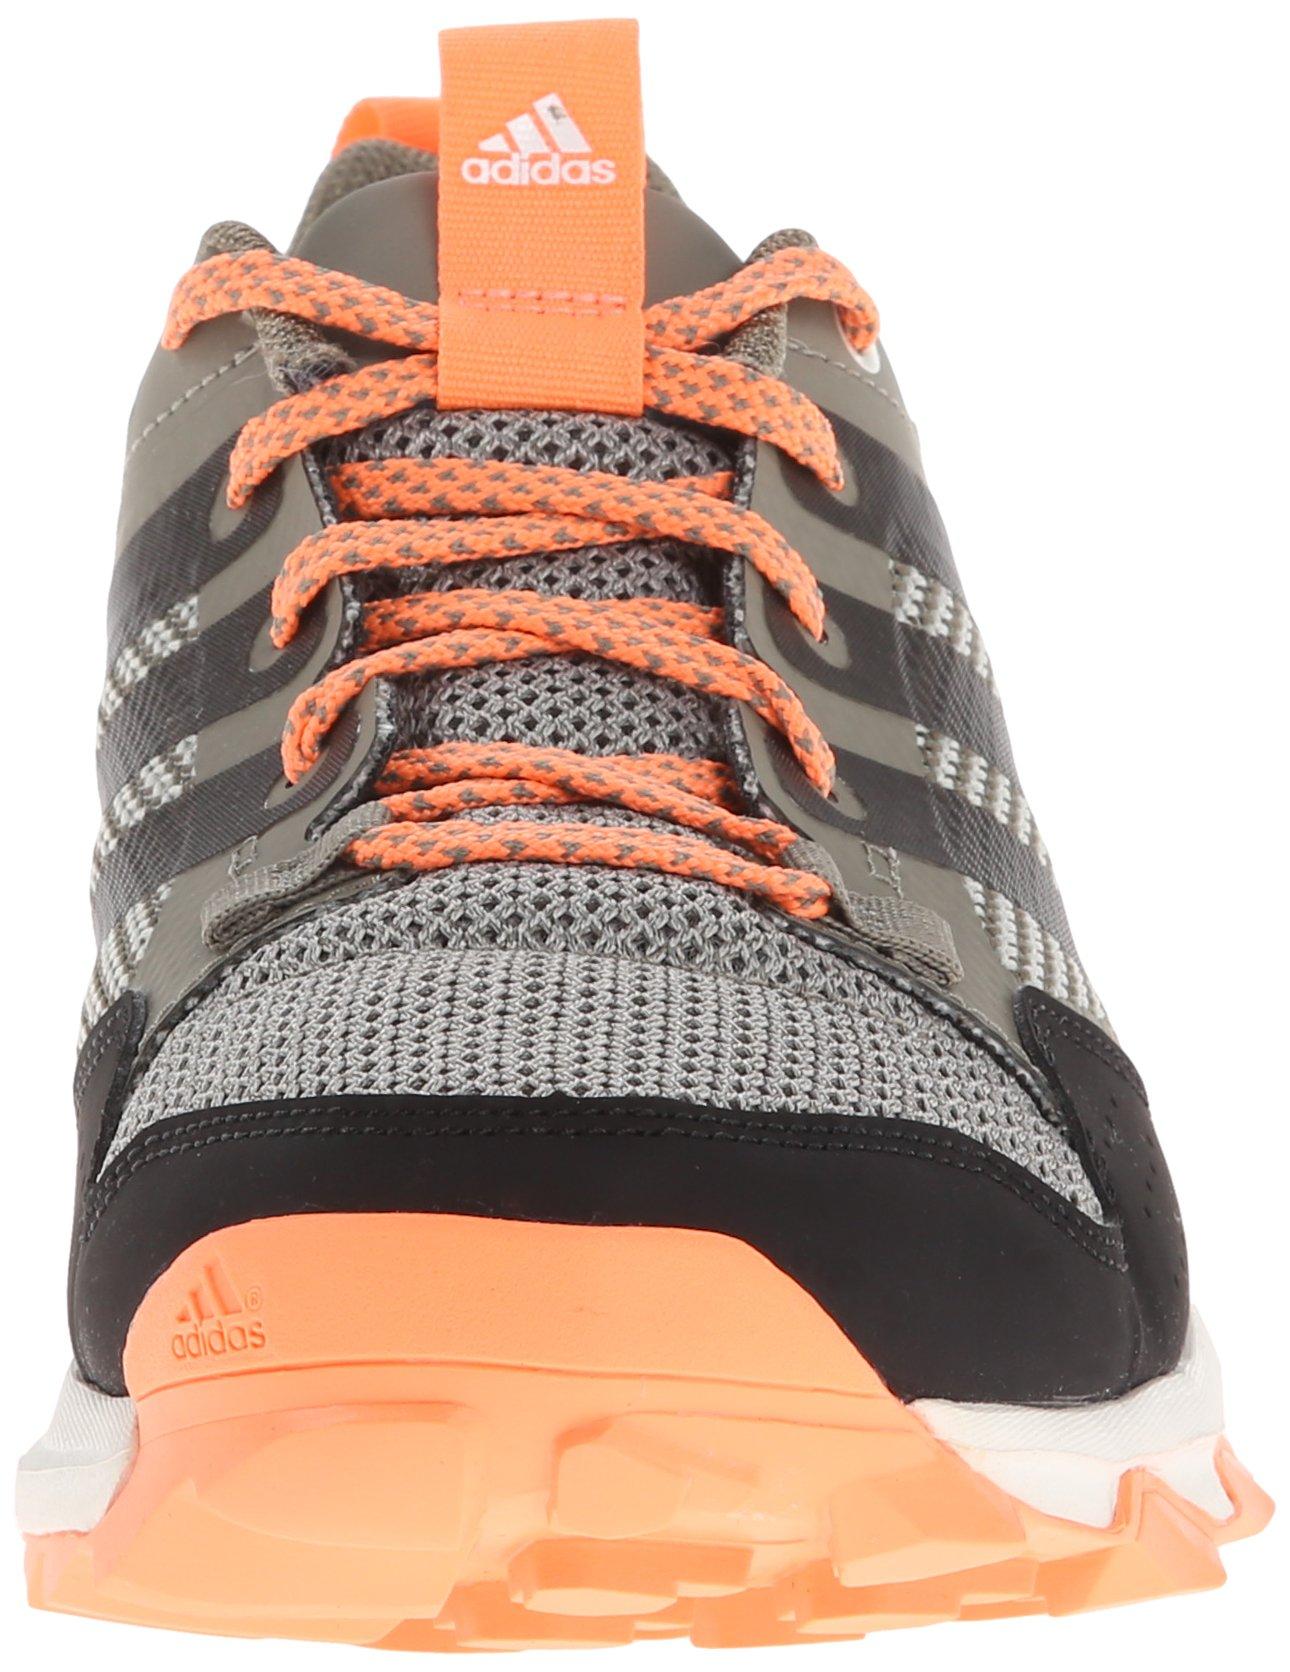 adidas Performance Women's Kanadia 7 TR W Trail Running Shoe, Clay/Chalk/Flash Orange, 7 M US by adidas (Image #4)